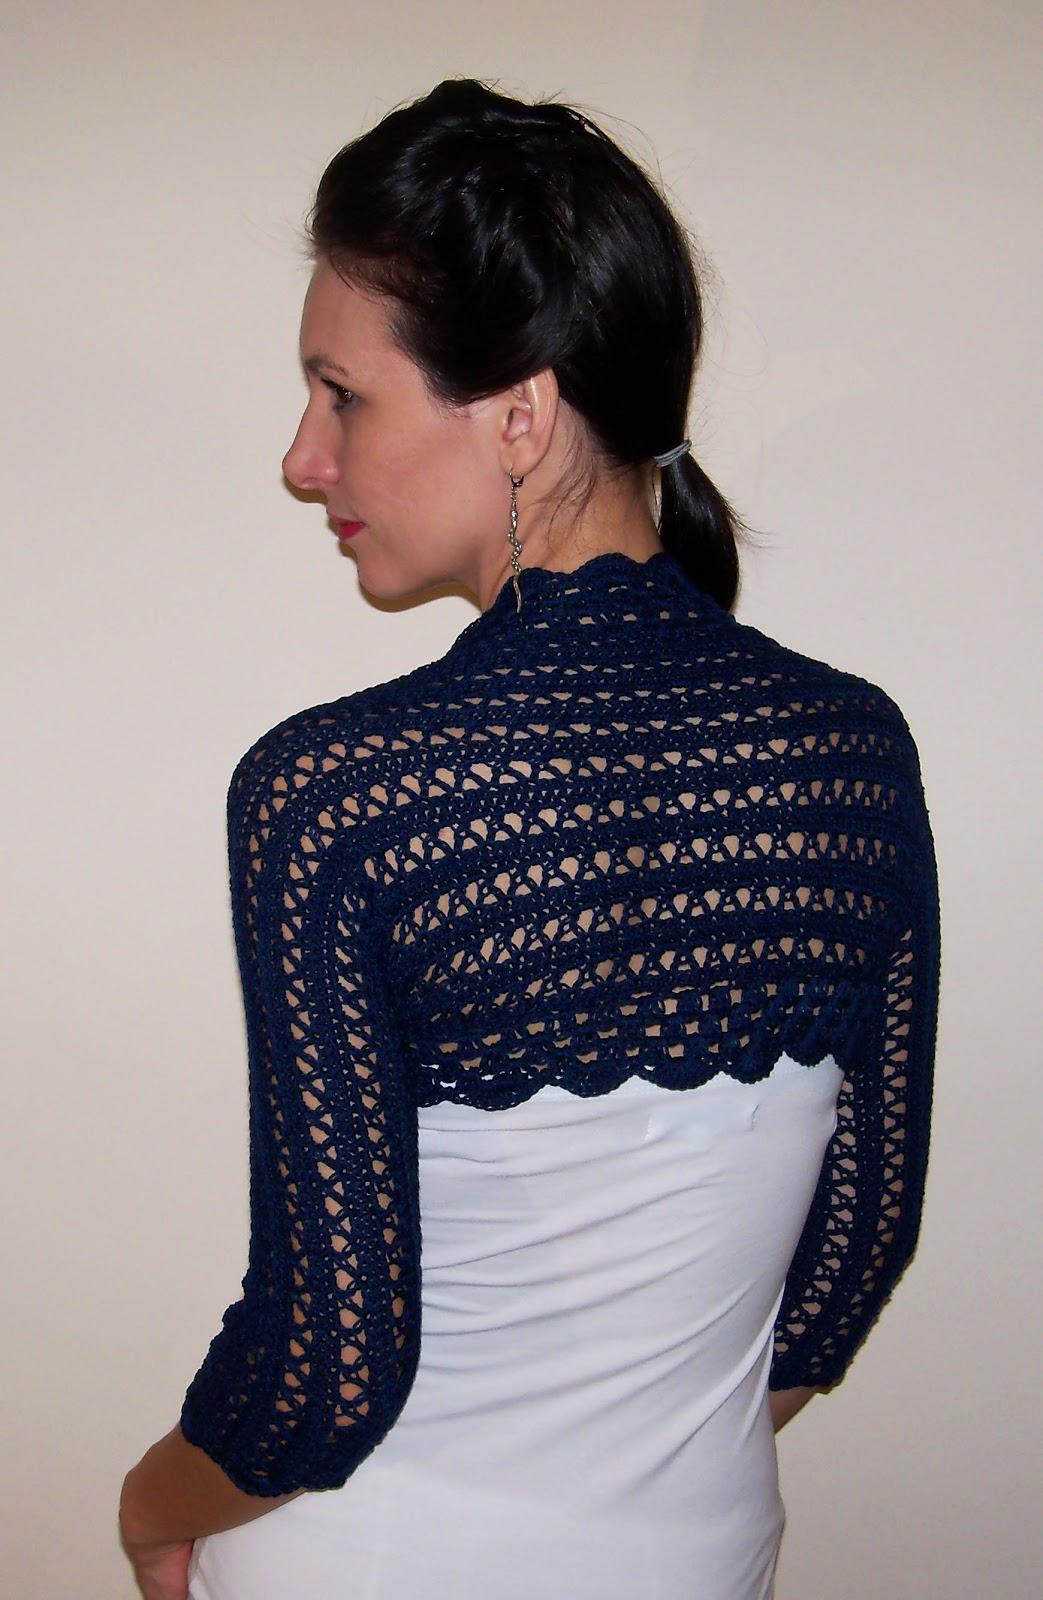 Cotton wedding bolero jacket crochet lace shrug navy blue size XS, S ...